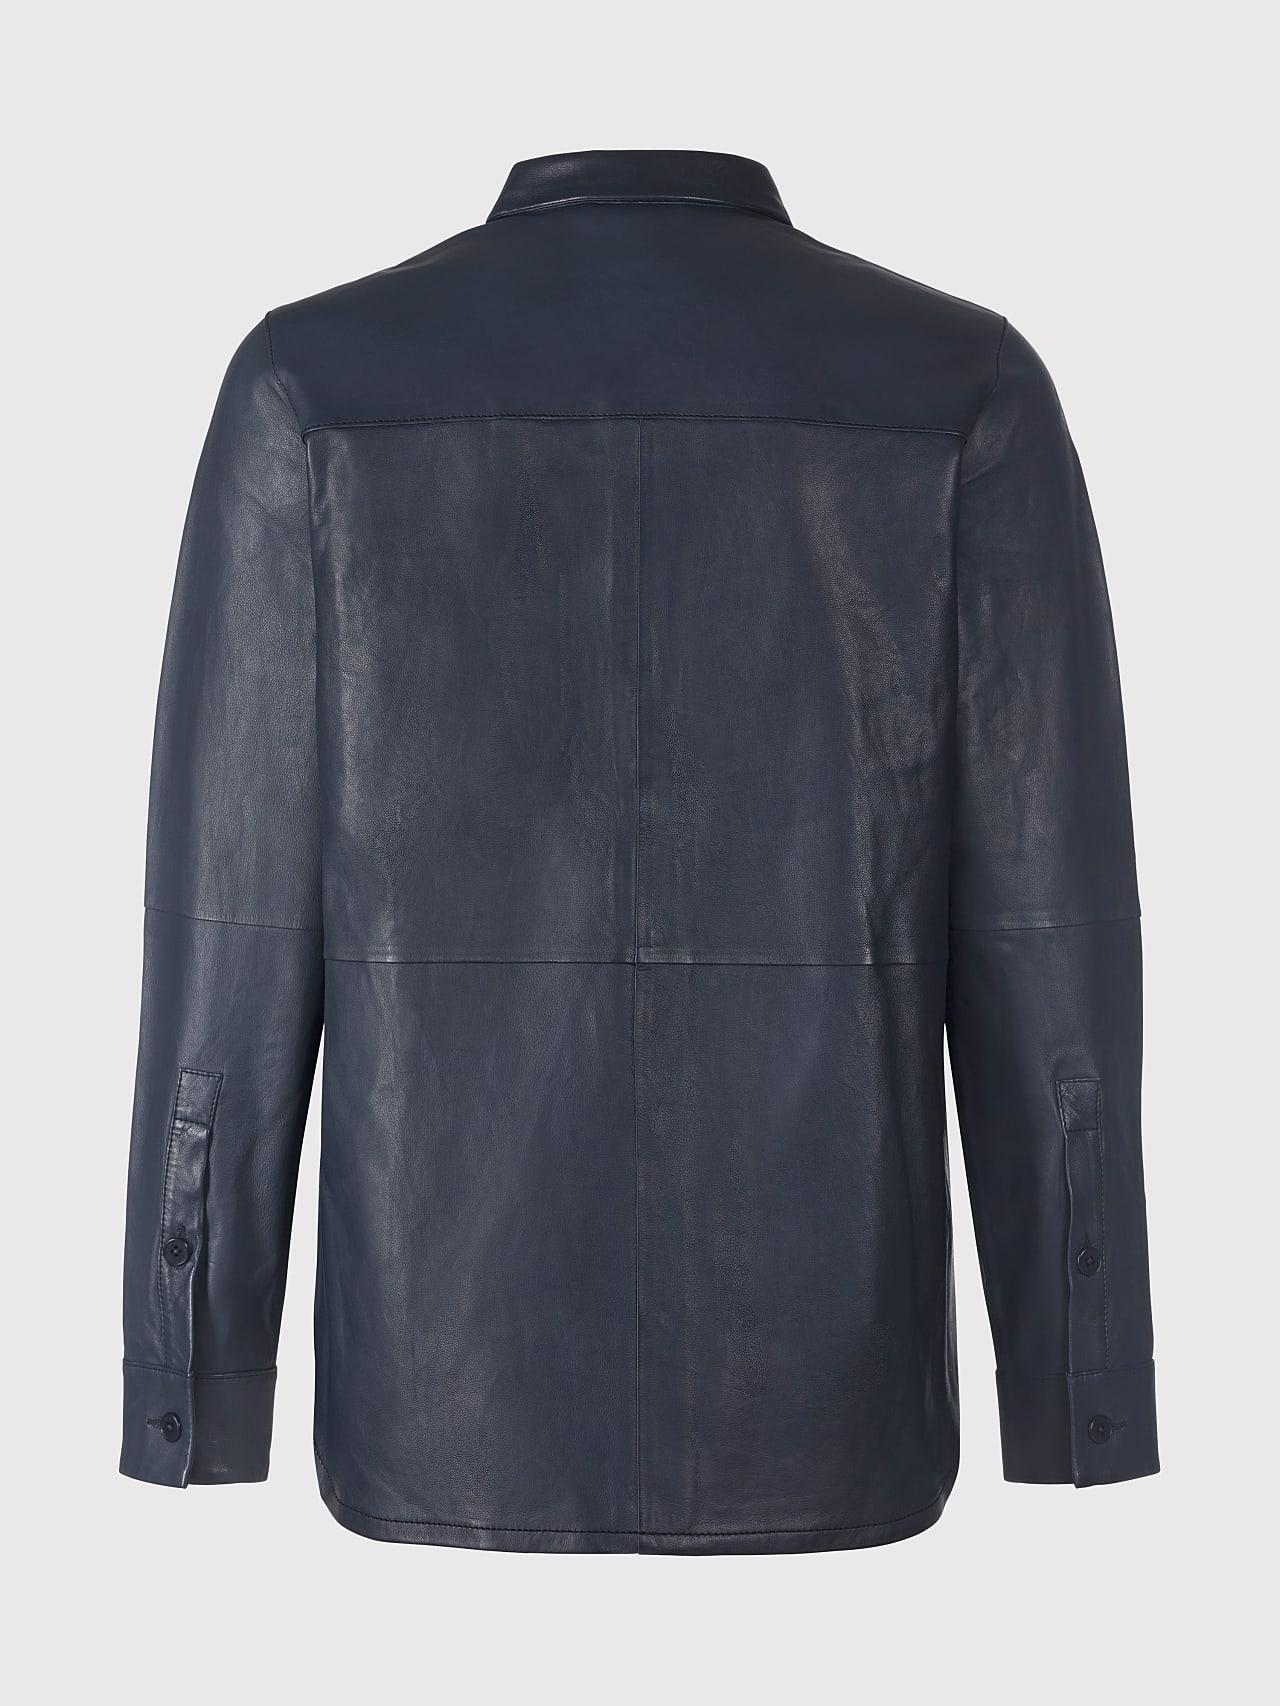 LEORD V1.Y5.01 Leather Shirt navy Left Alpha Tauri